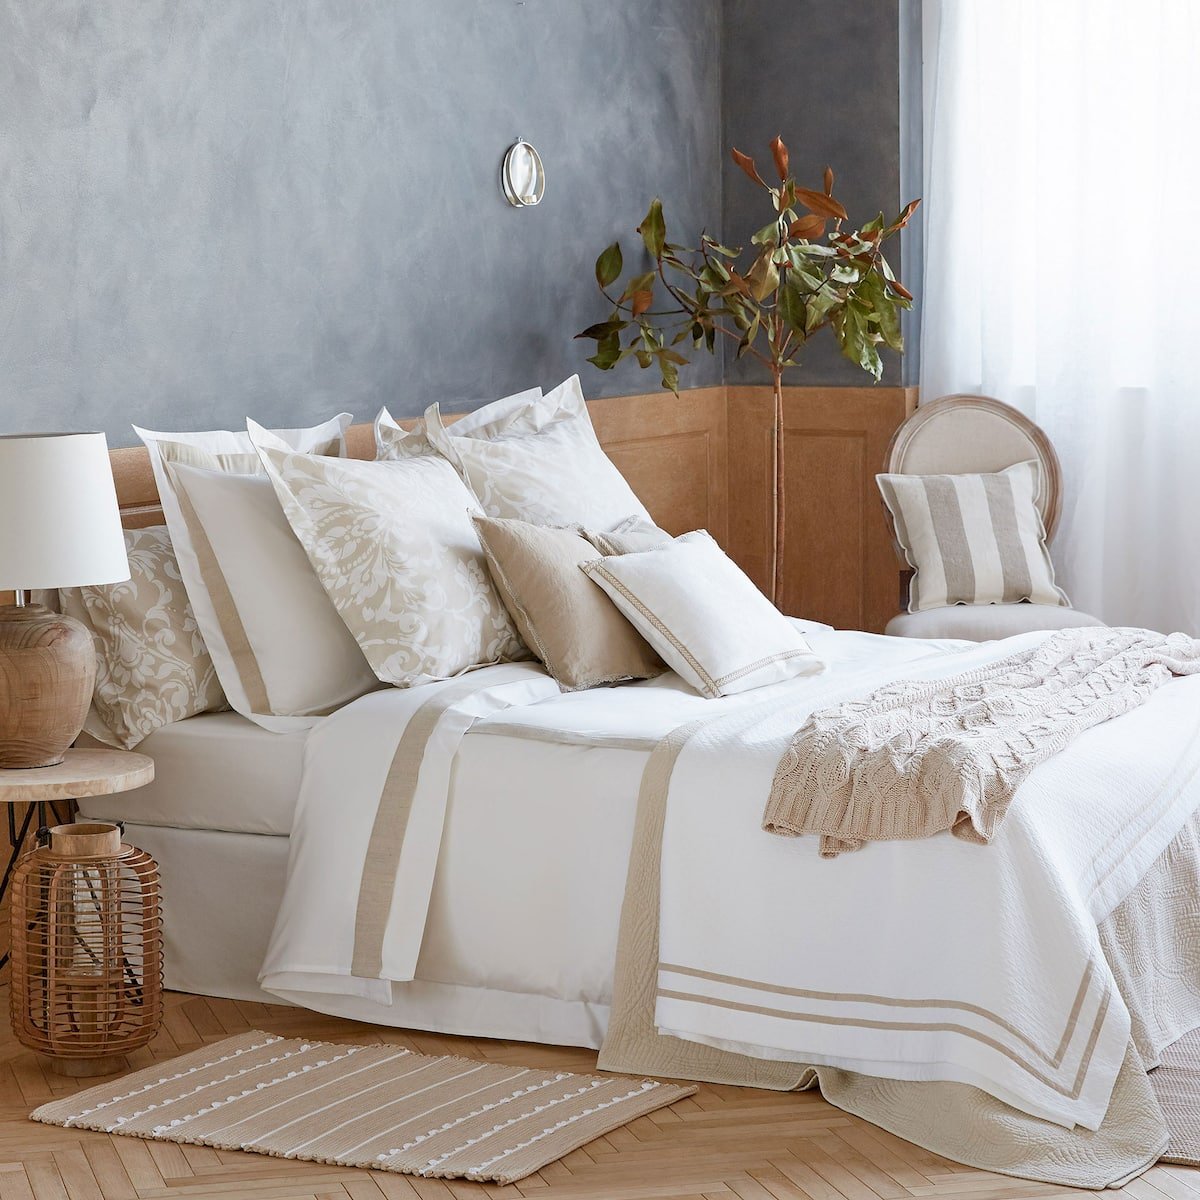 linge de maison en lin great linge de lit toulouse linge lit lin bed and philosophy trentotto. Black Bedroom Furniture Sets. Home Design Ideas